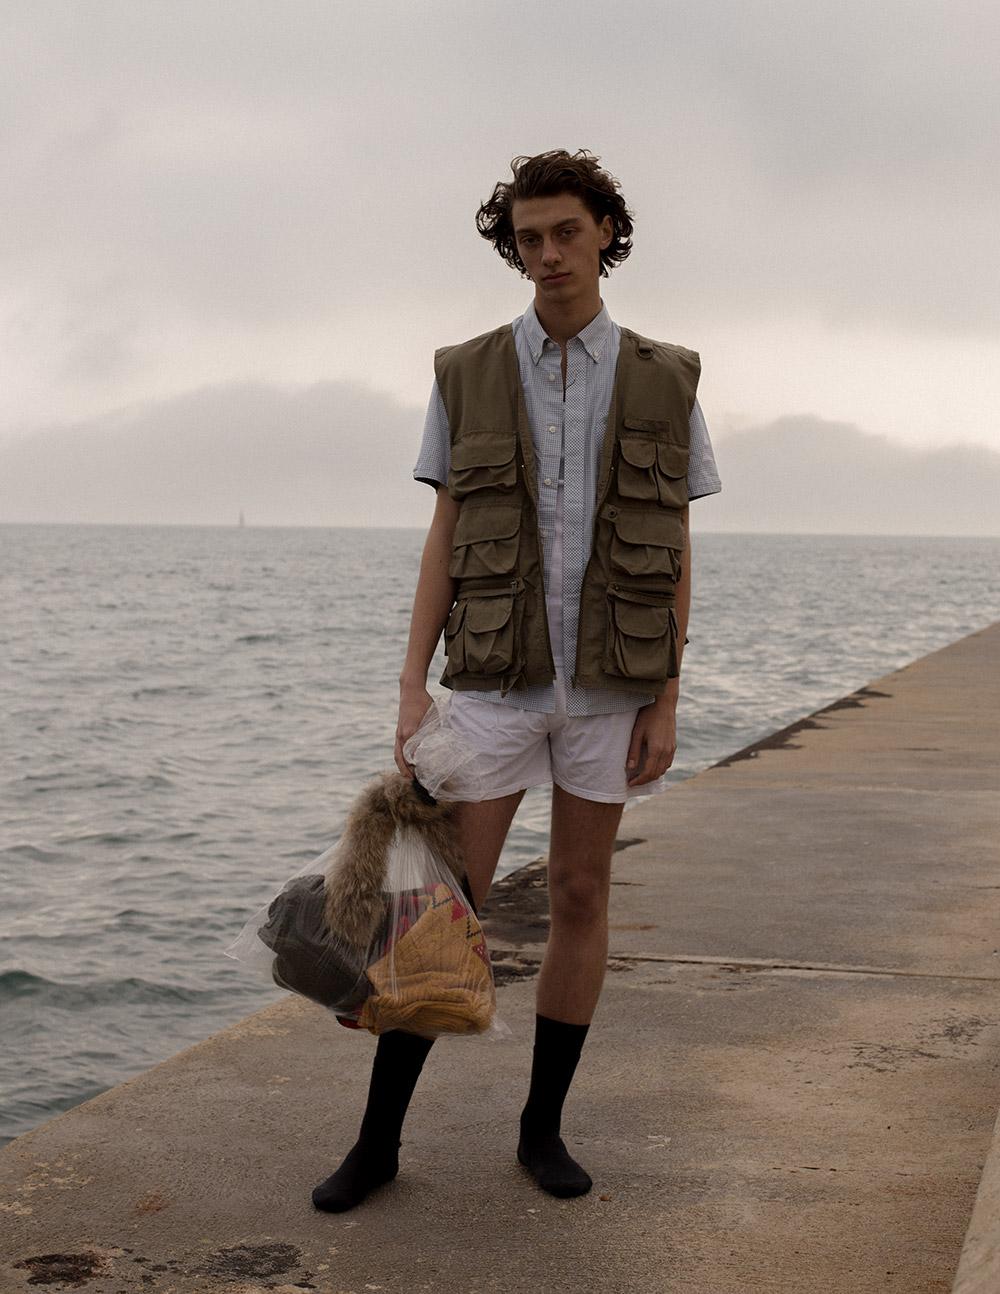 Shirt Fred Perry, vest, socks & underwear stylist own.